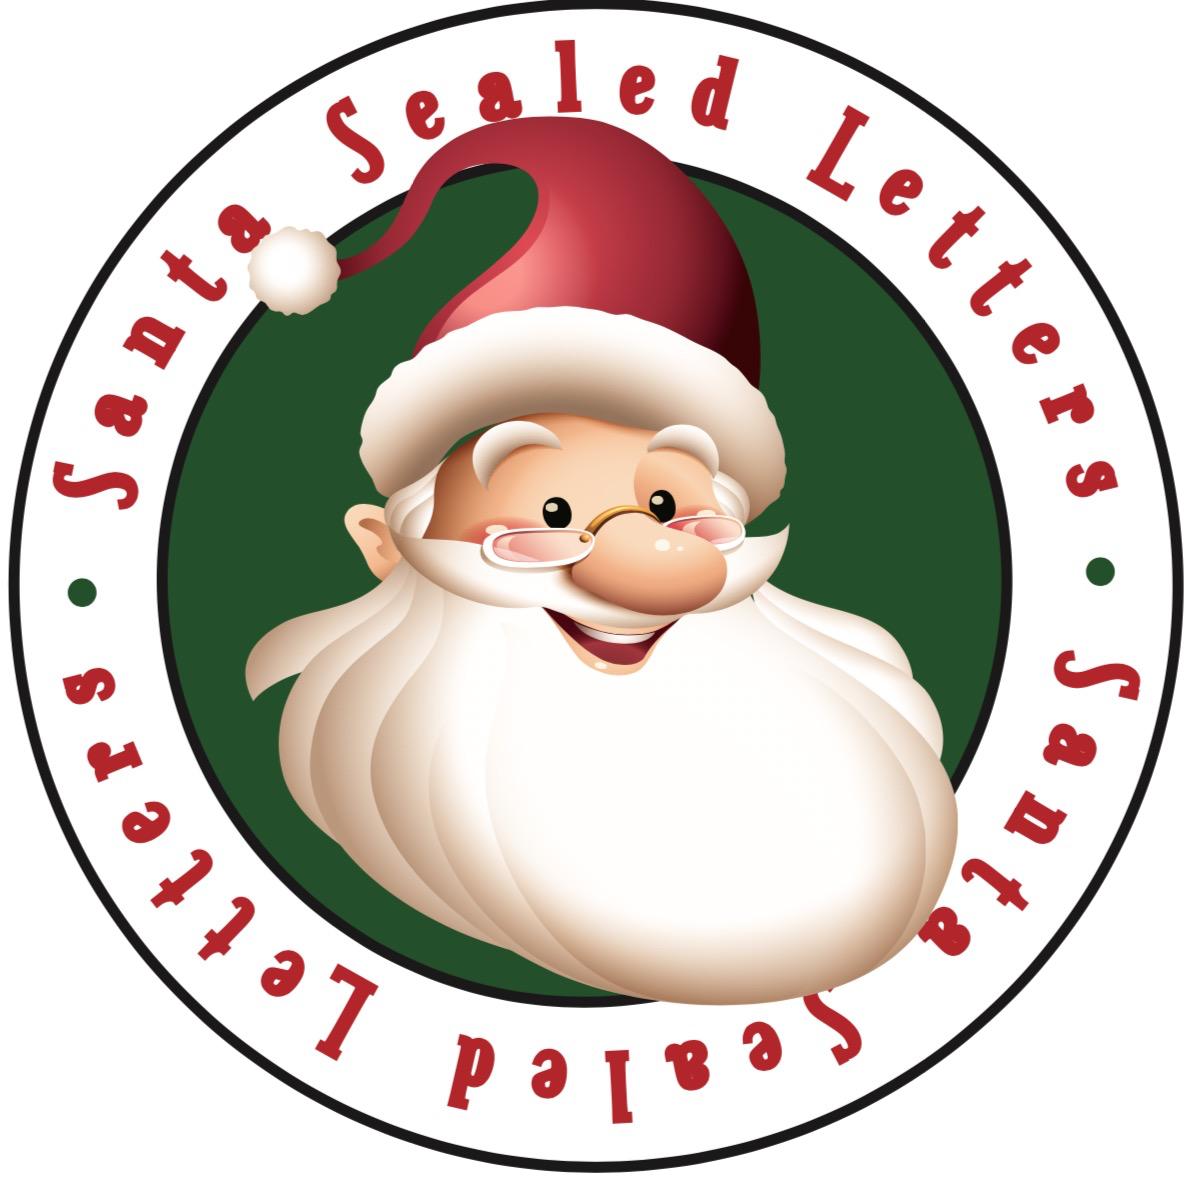 Santa Sealed Letters